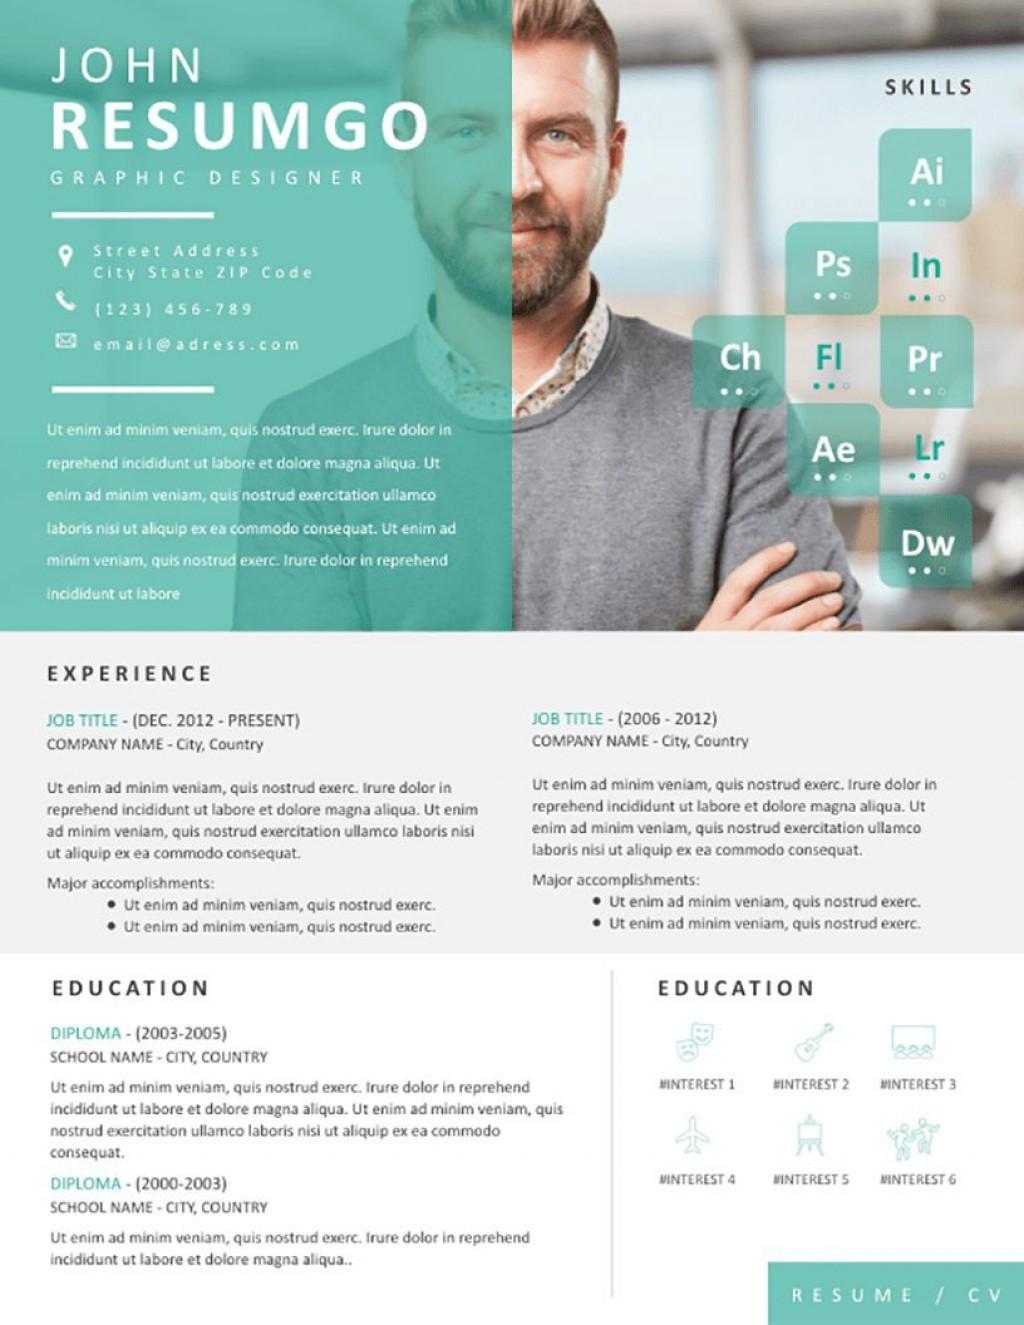 002 Stupendou Eye Catching Resume Template Photo  Microsoft Word Free Download MostLarge